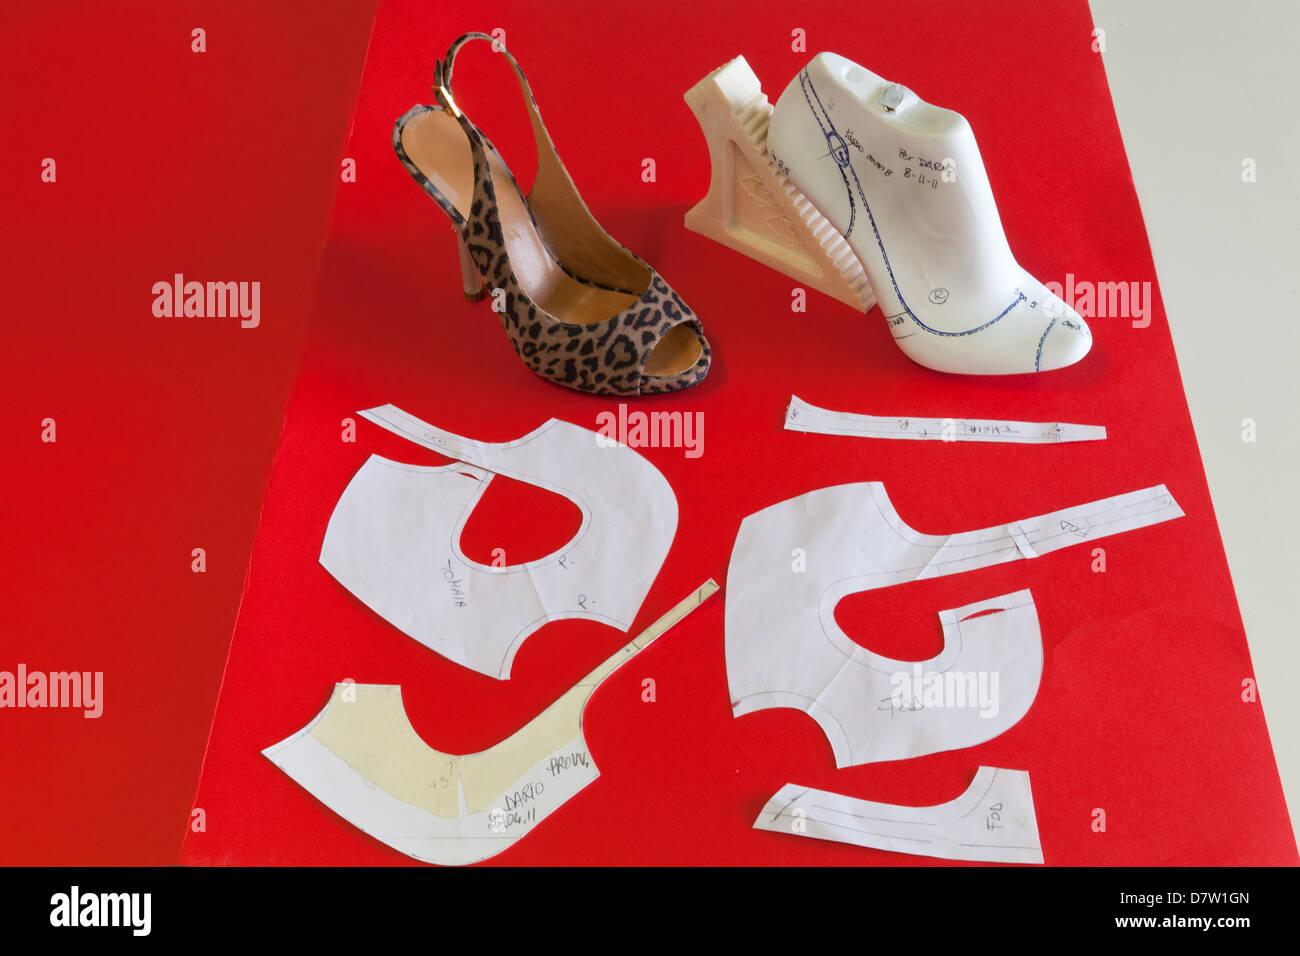 Aus Papiermuster am fertigen Schuh Cercal Schuhe Schule, San Mauro Pascoli, Emilia-Romagna, Italien Stockbild